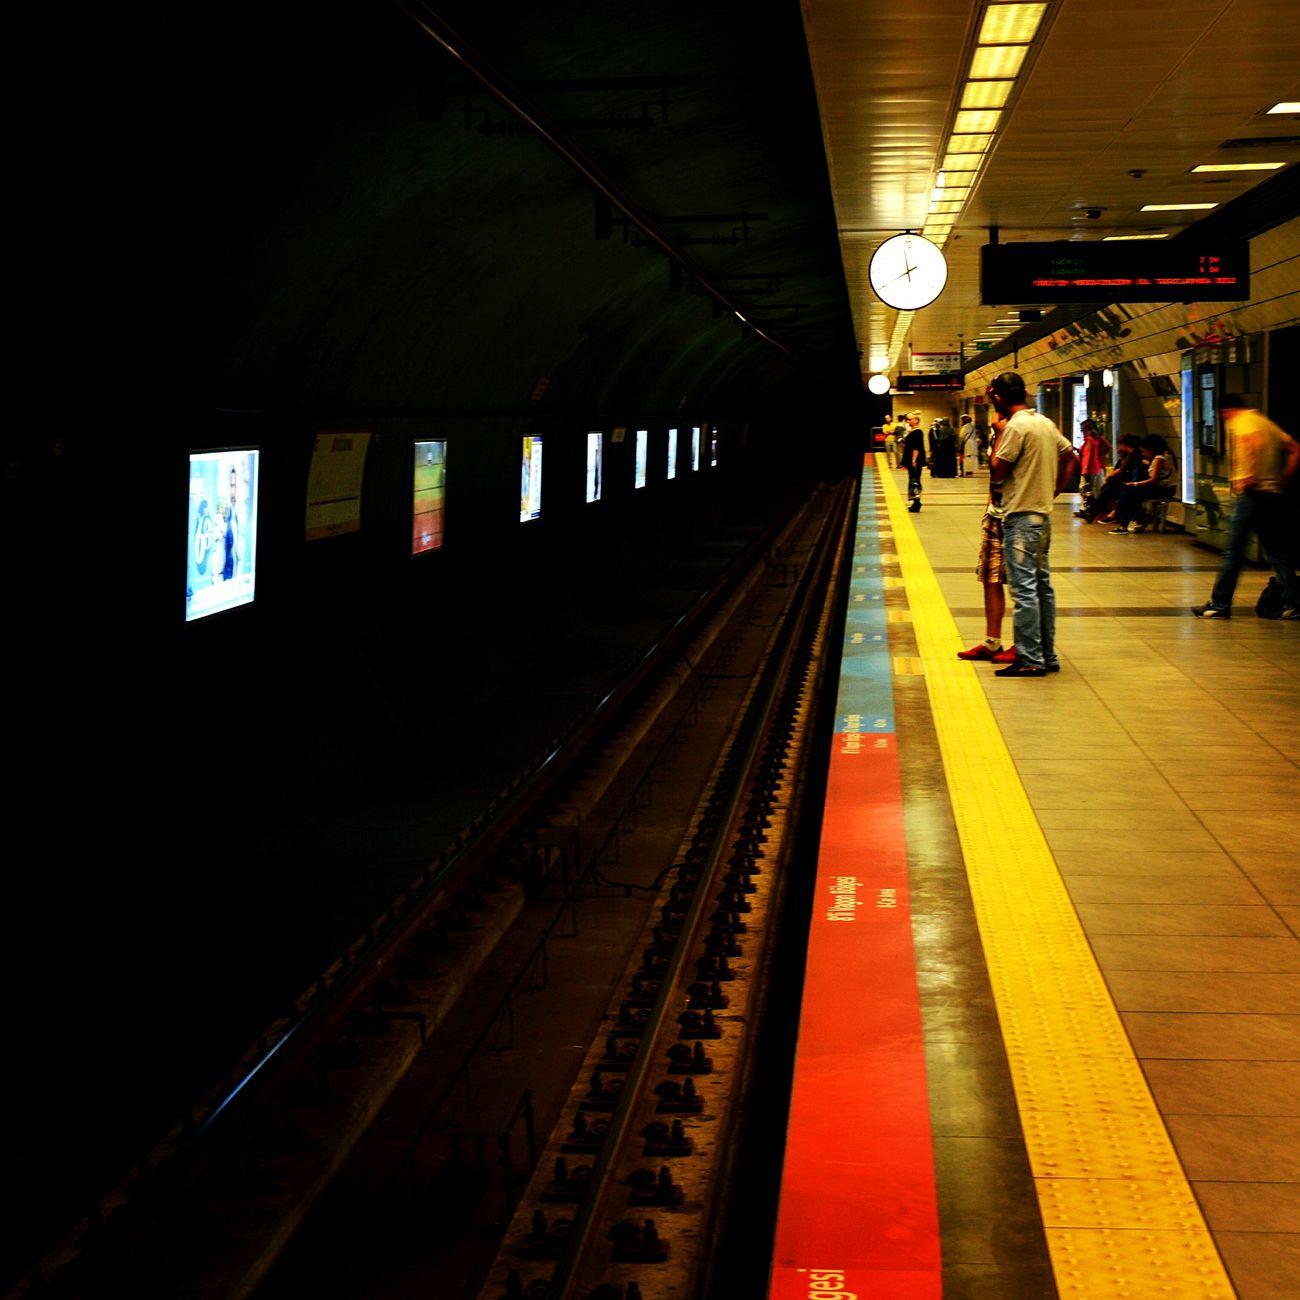 Metro Underground Istanbulmetro Istasyon Subway Station Underground Station  PhotoByMuratGul